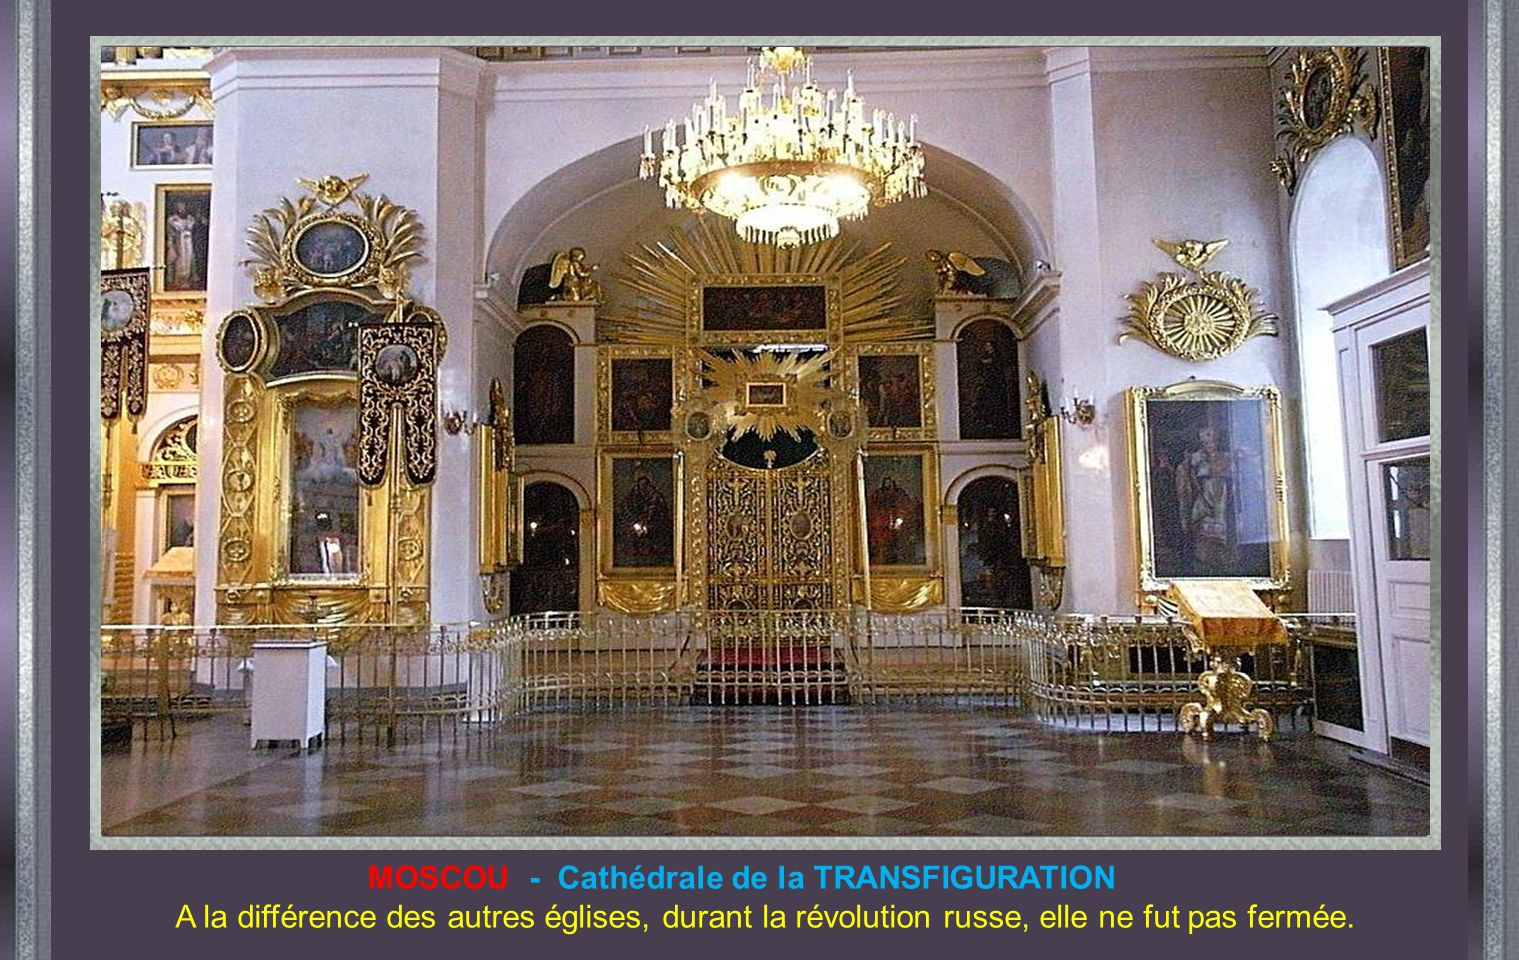 MOSCOU - Cathédrale de la TRANSFIGURATION